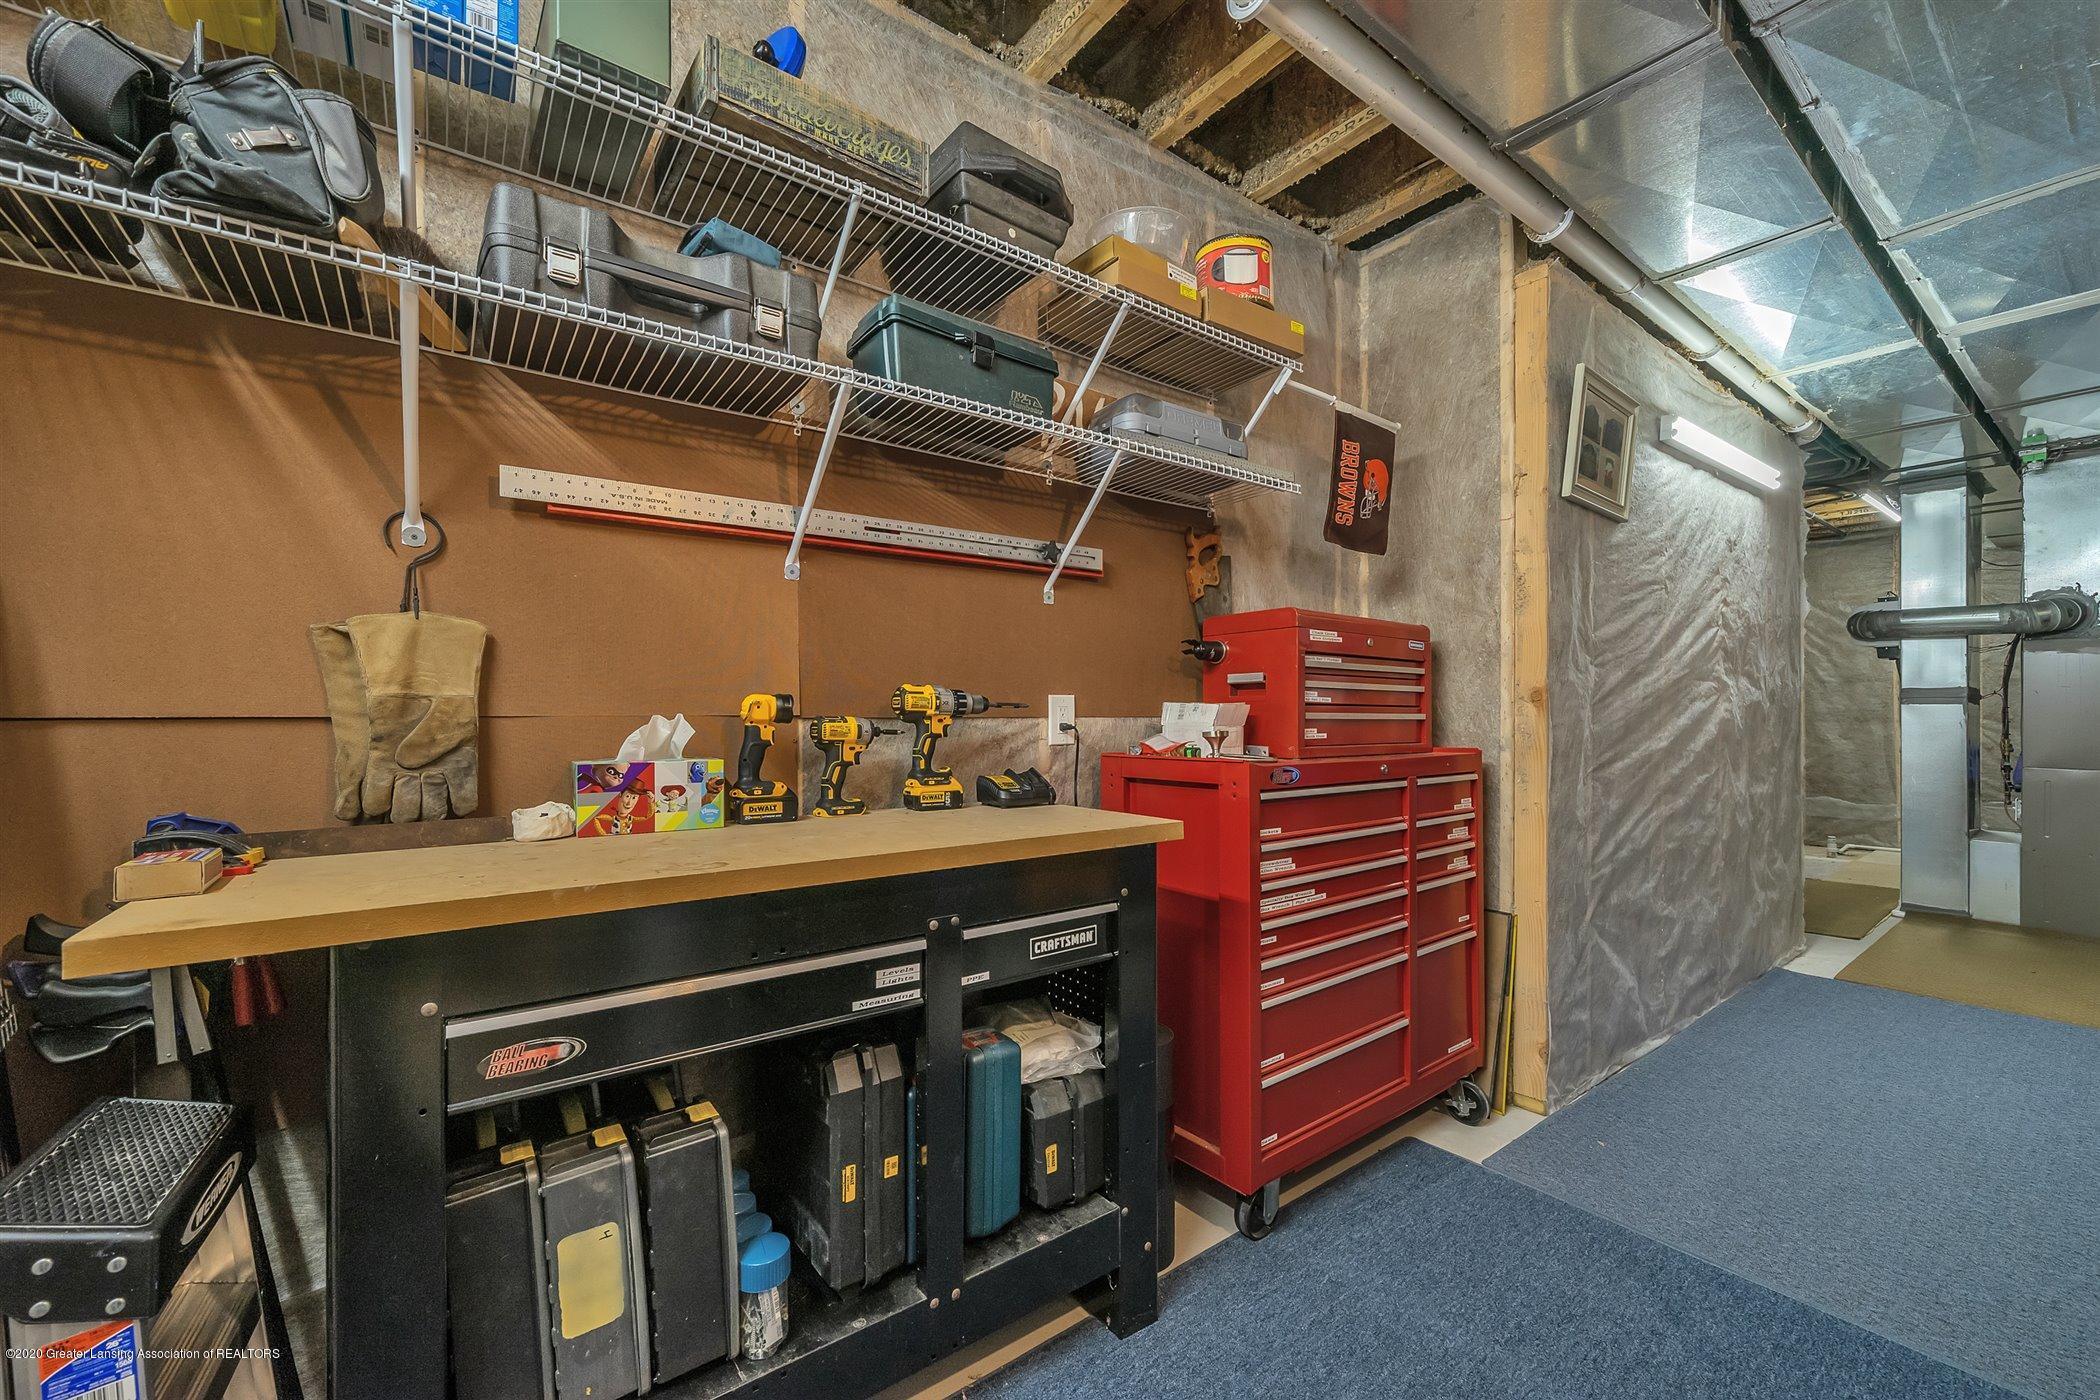 6090 Sleepy Hollow Ln - (39) LOWER LEVEL Work Space Storage - 40